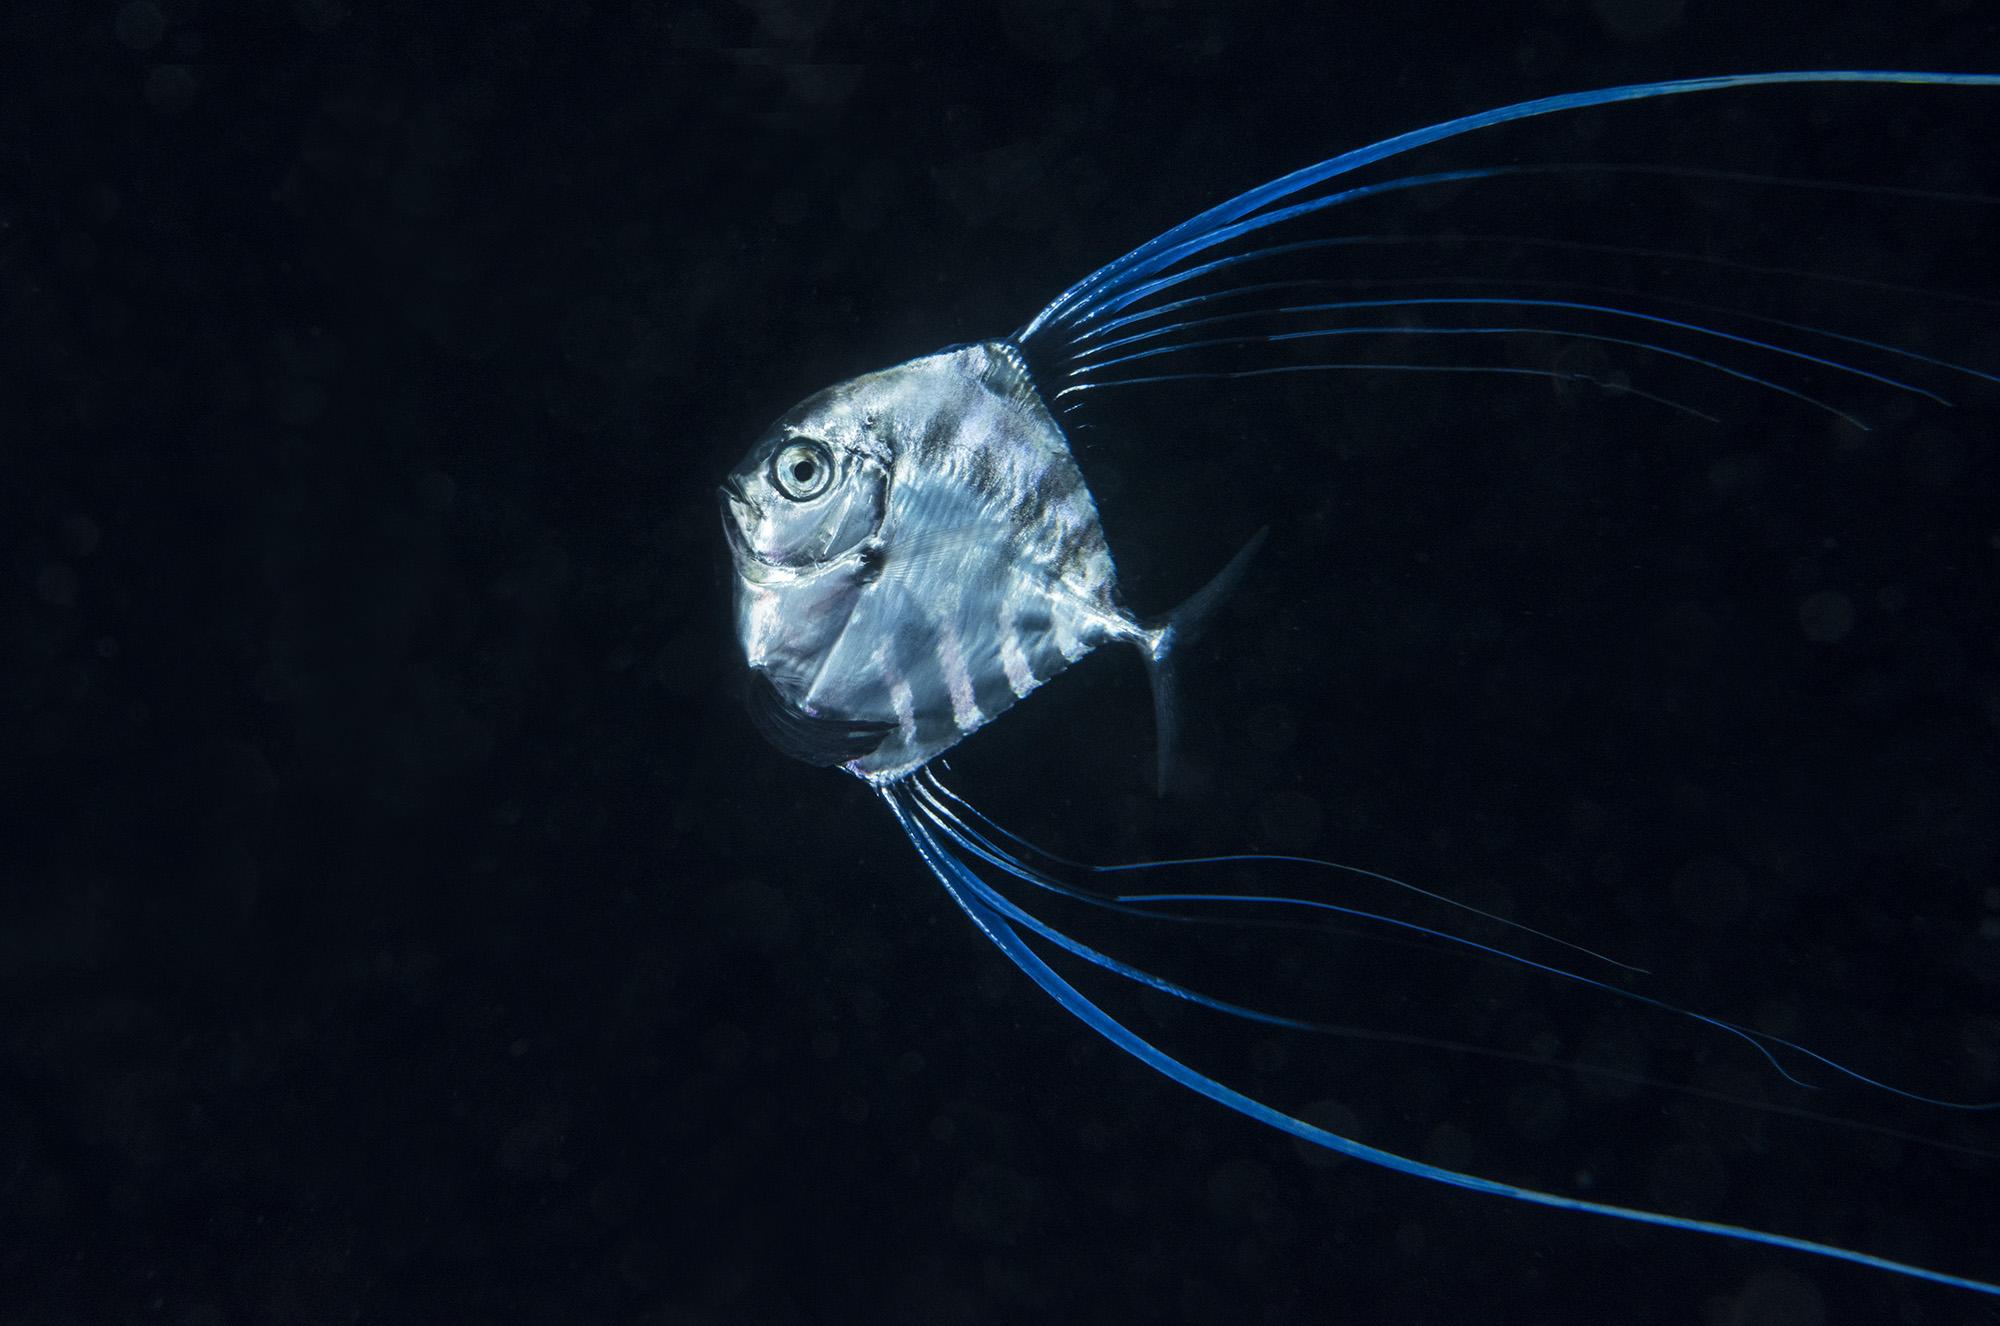 Juvenile African Popamo credit: richard barnden / coral reef image bank